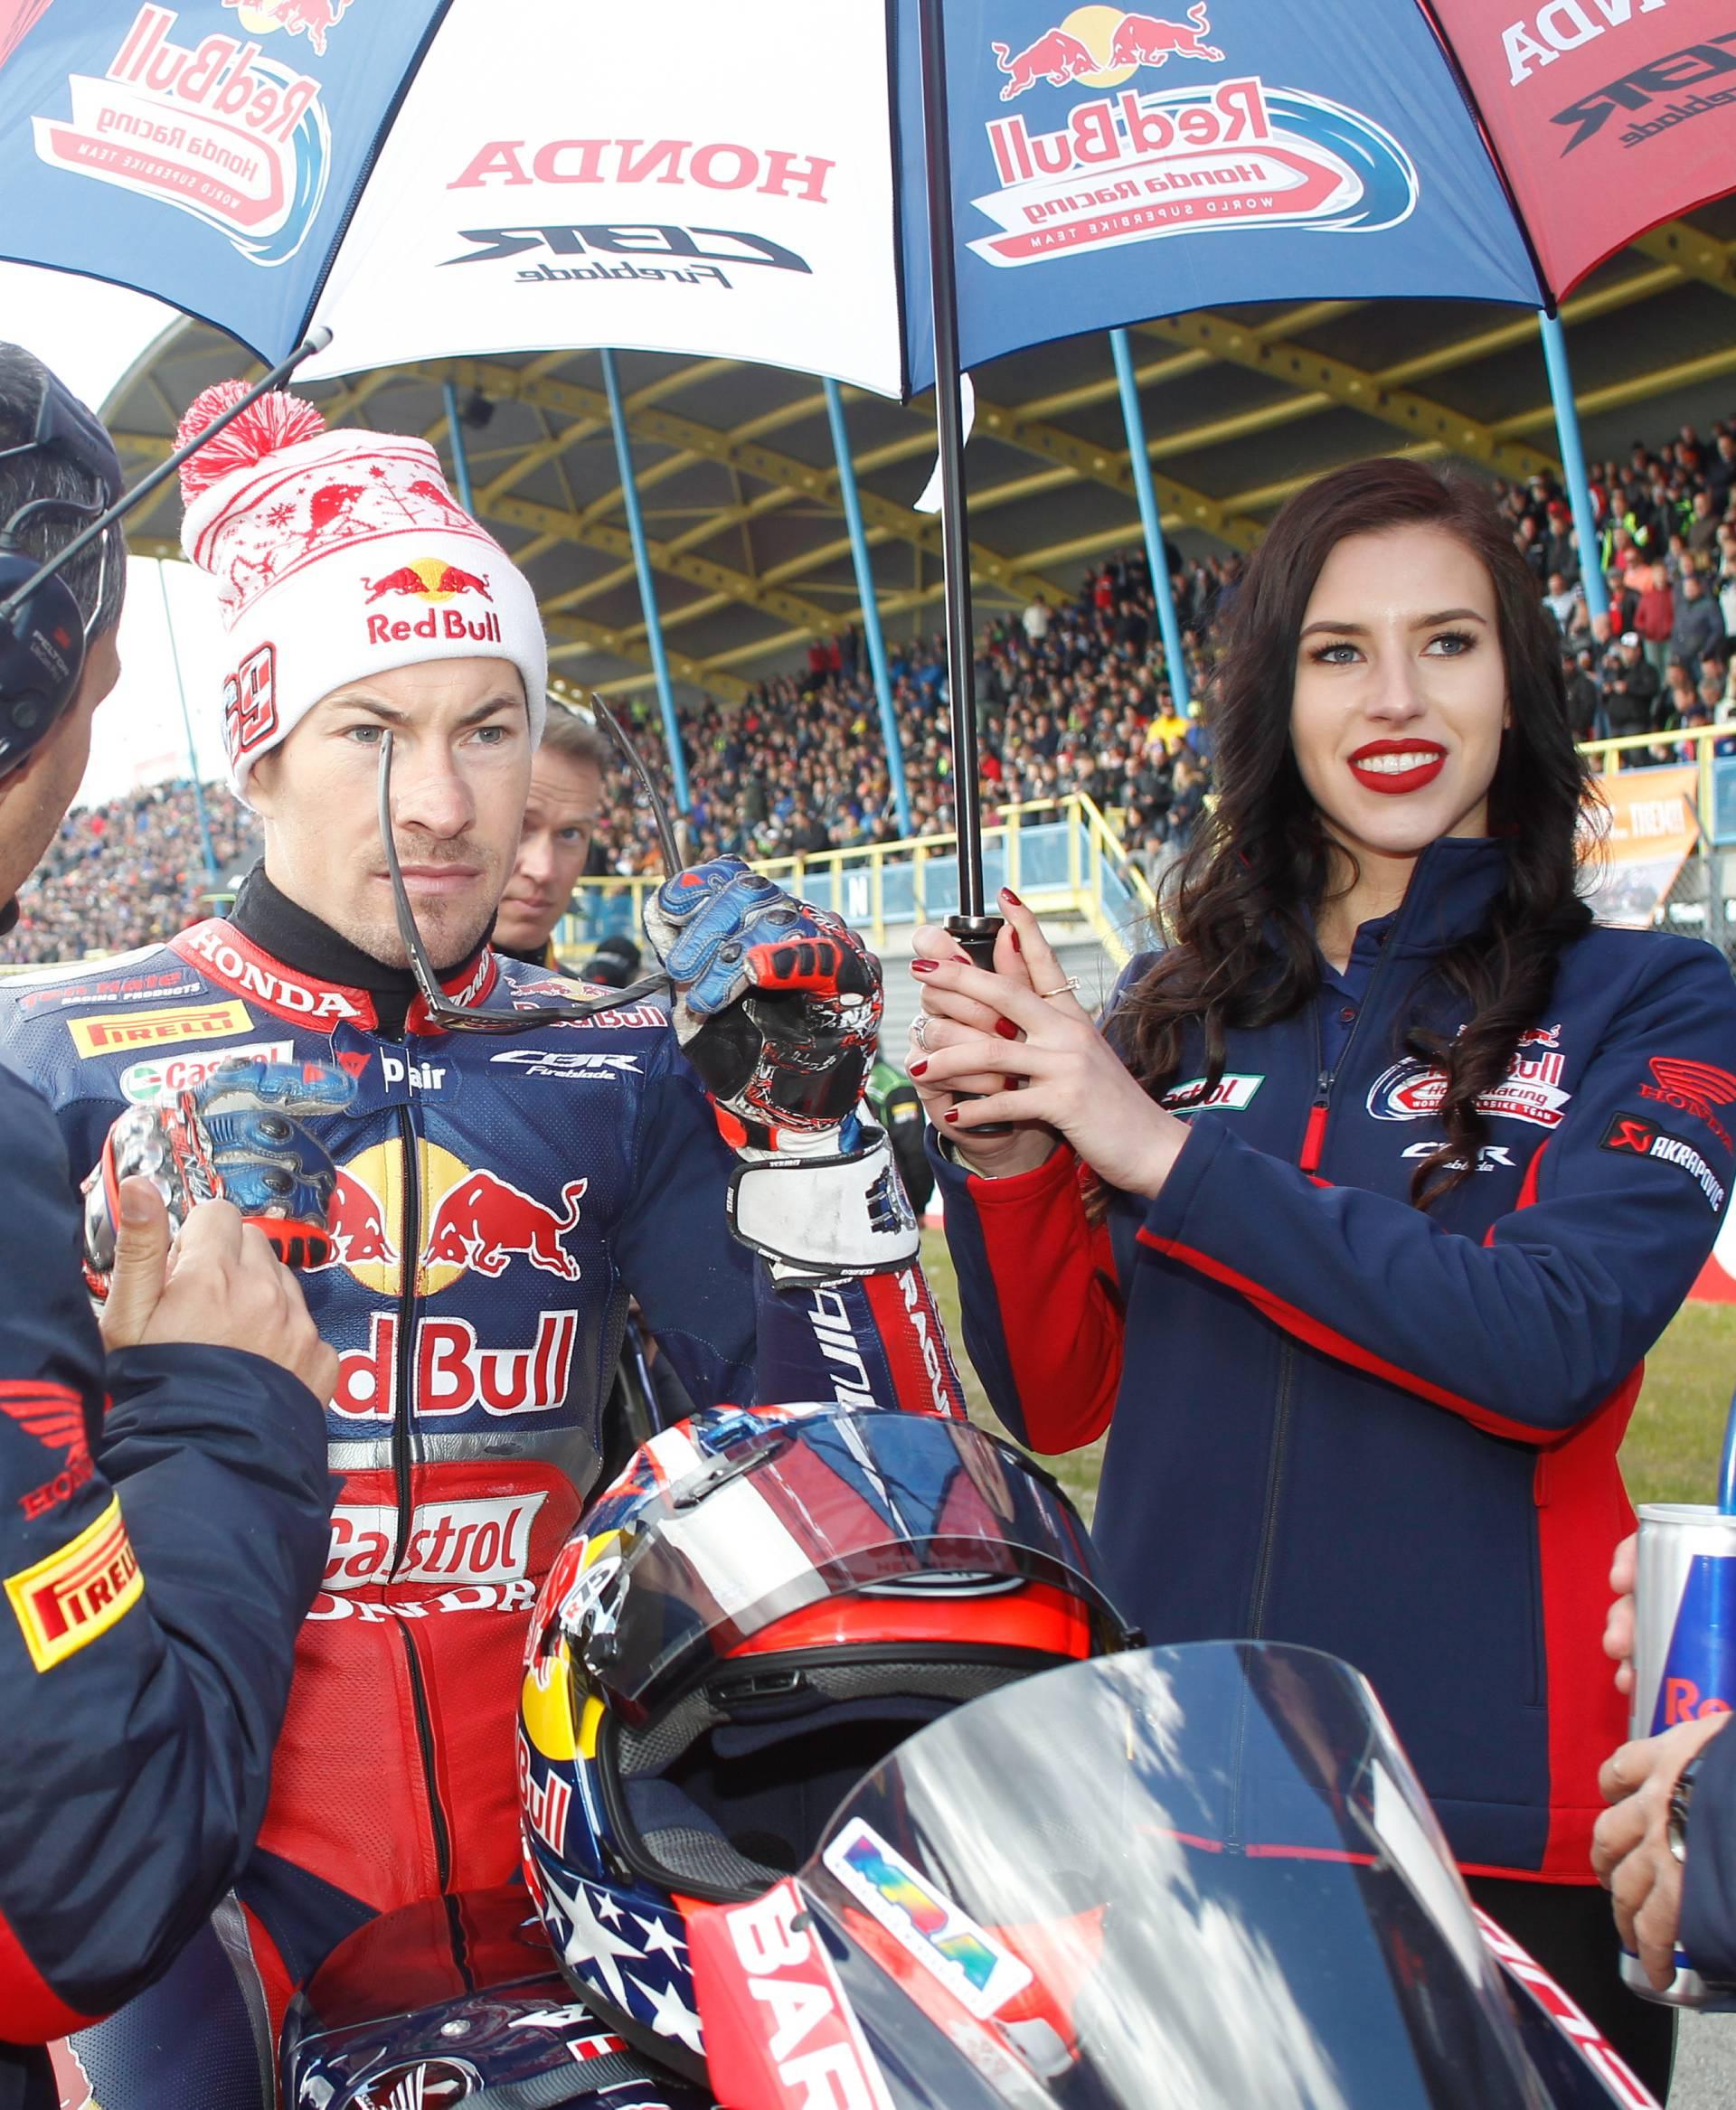 FIM Superbike World Championship Circuit TT Assen 28-30.04.2017.